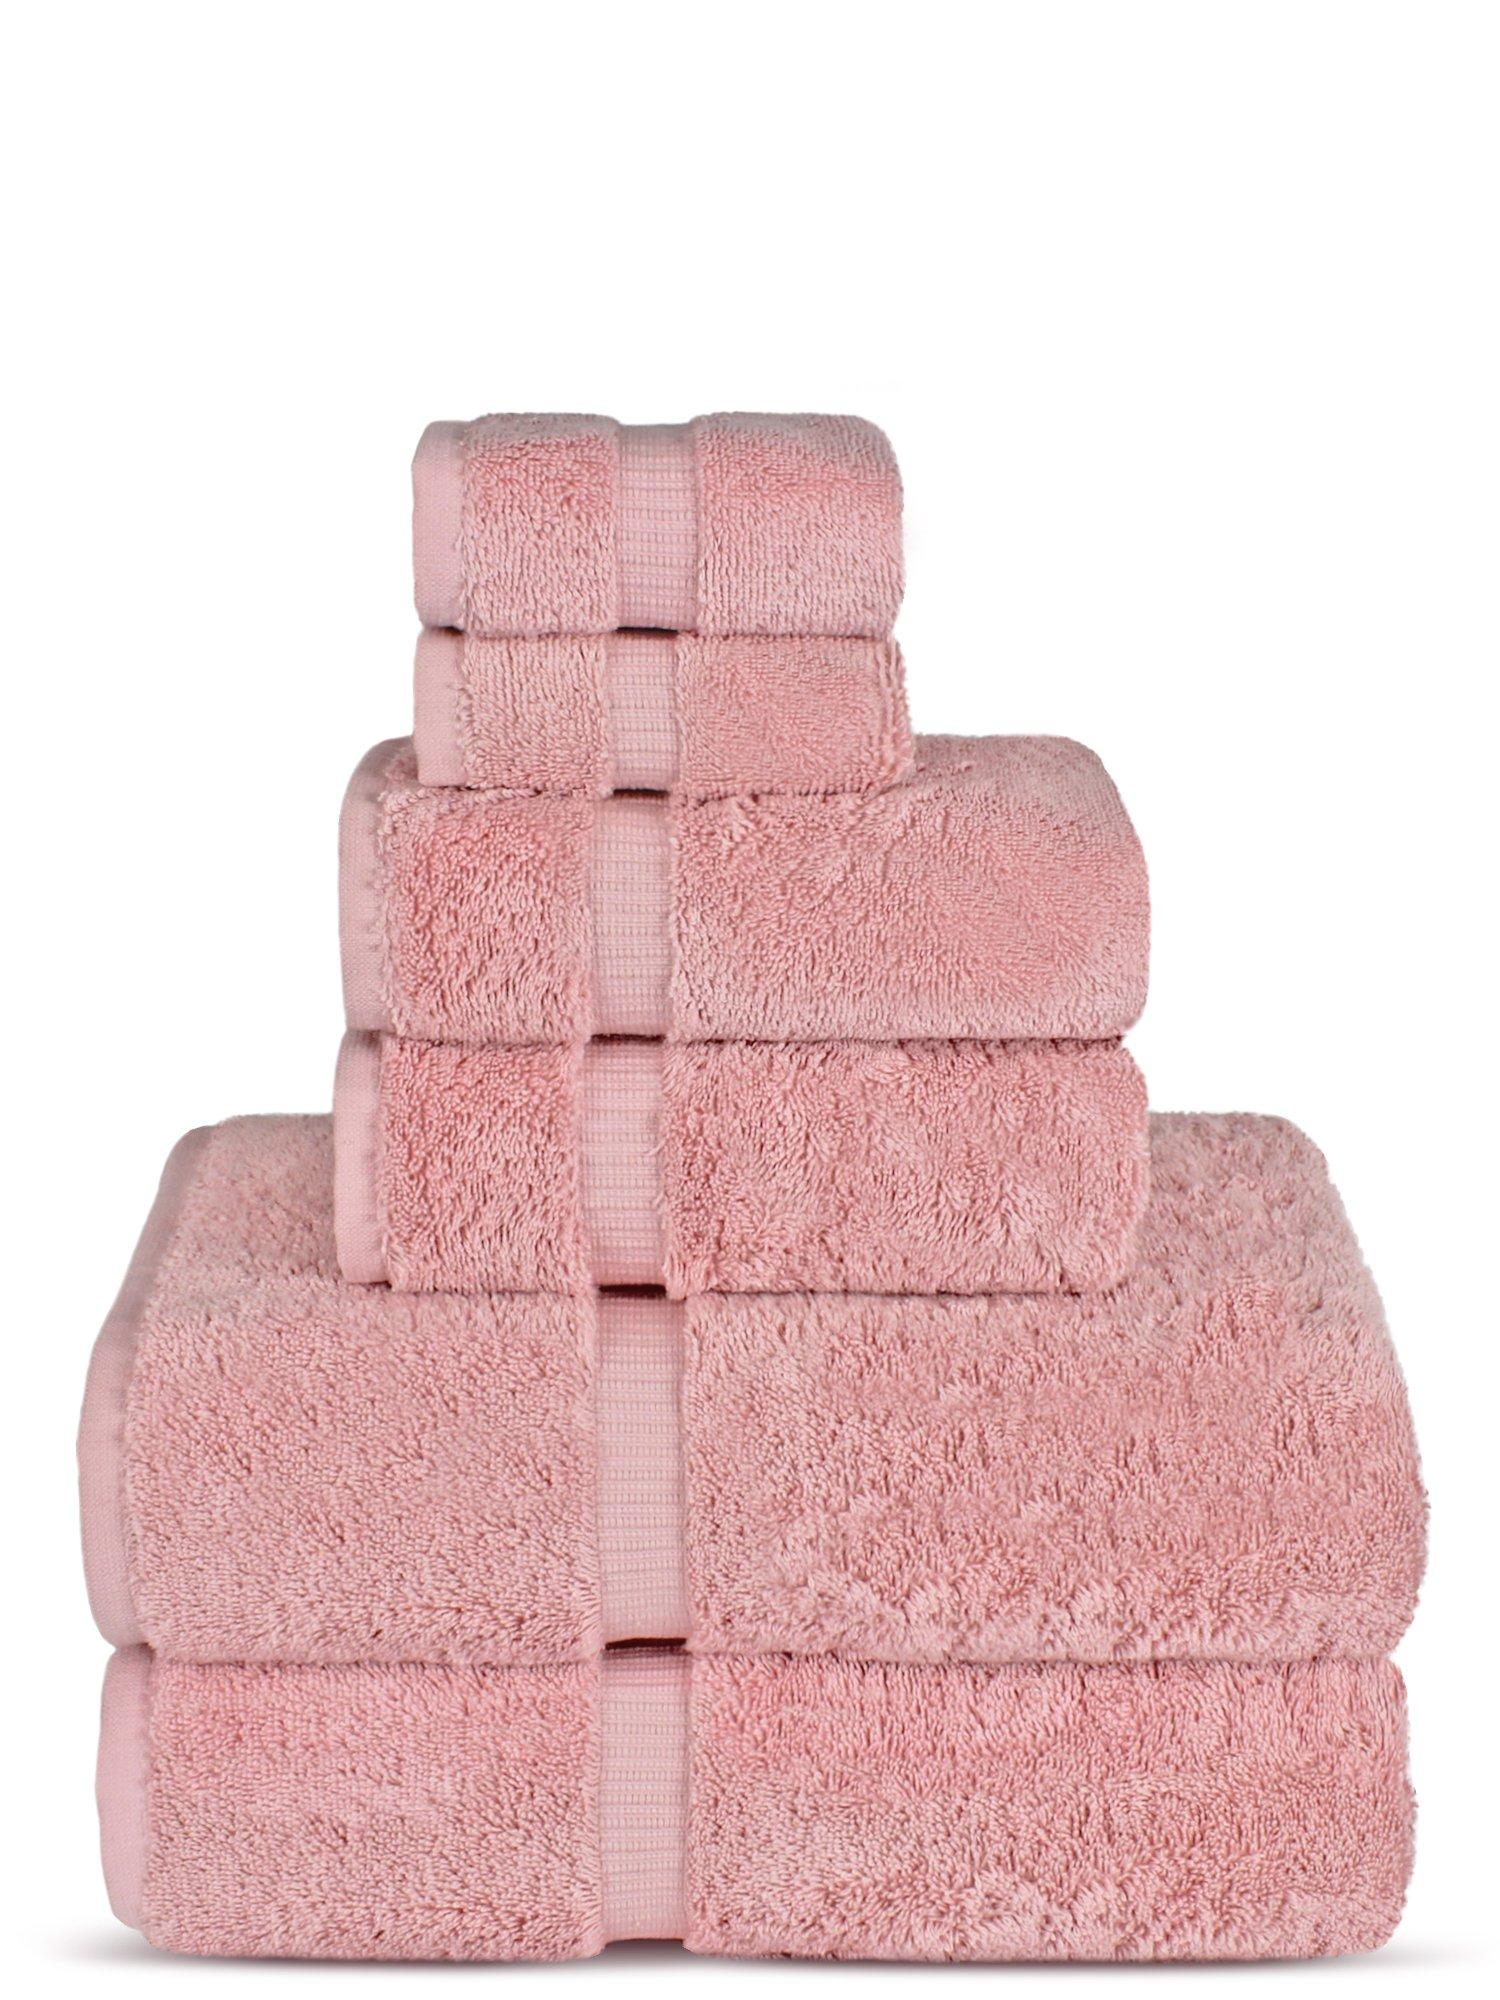 Luxury Spa and Hotel Quality Premium Turkish 6-Piece Towel Set (Pink, 2 x Bath Towels, 2 x Hand Towels, 2 x Washcloths)